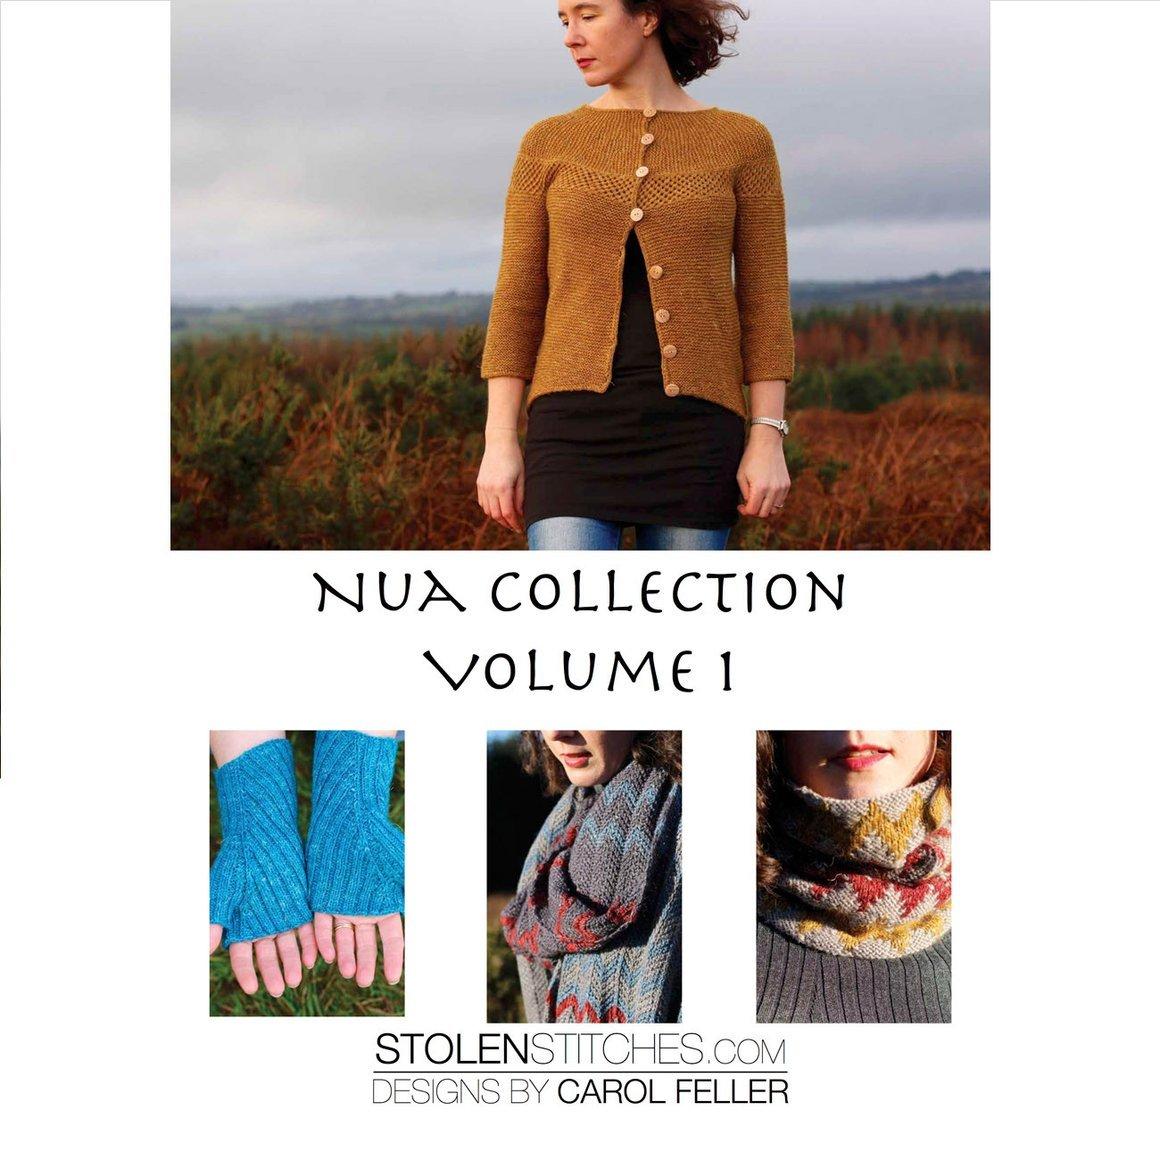 Stolen Stitches - Nua Collection Volume 1